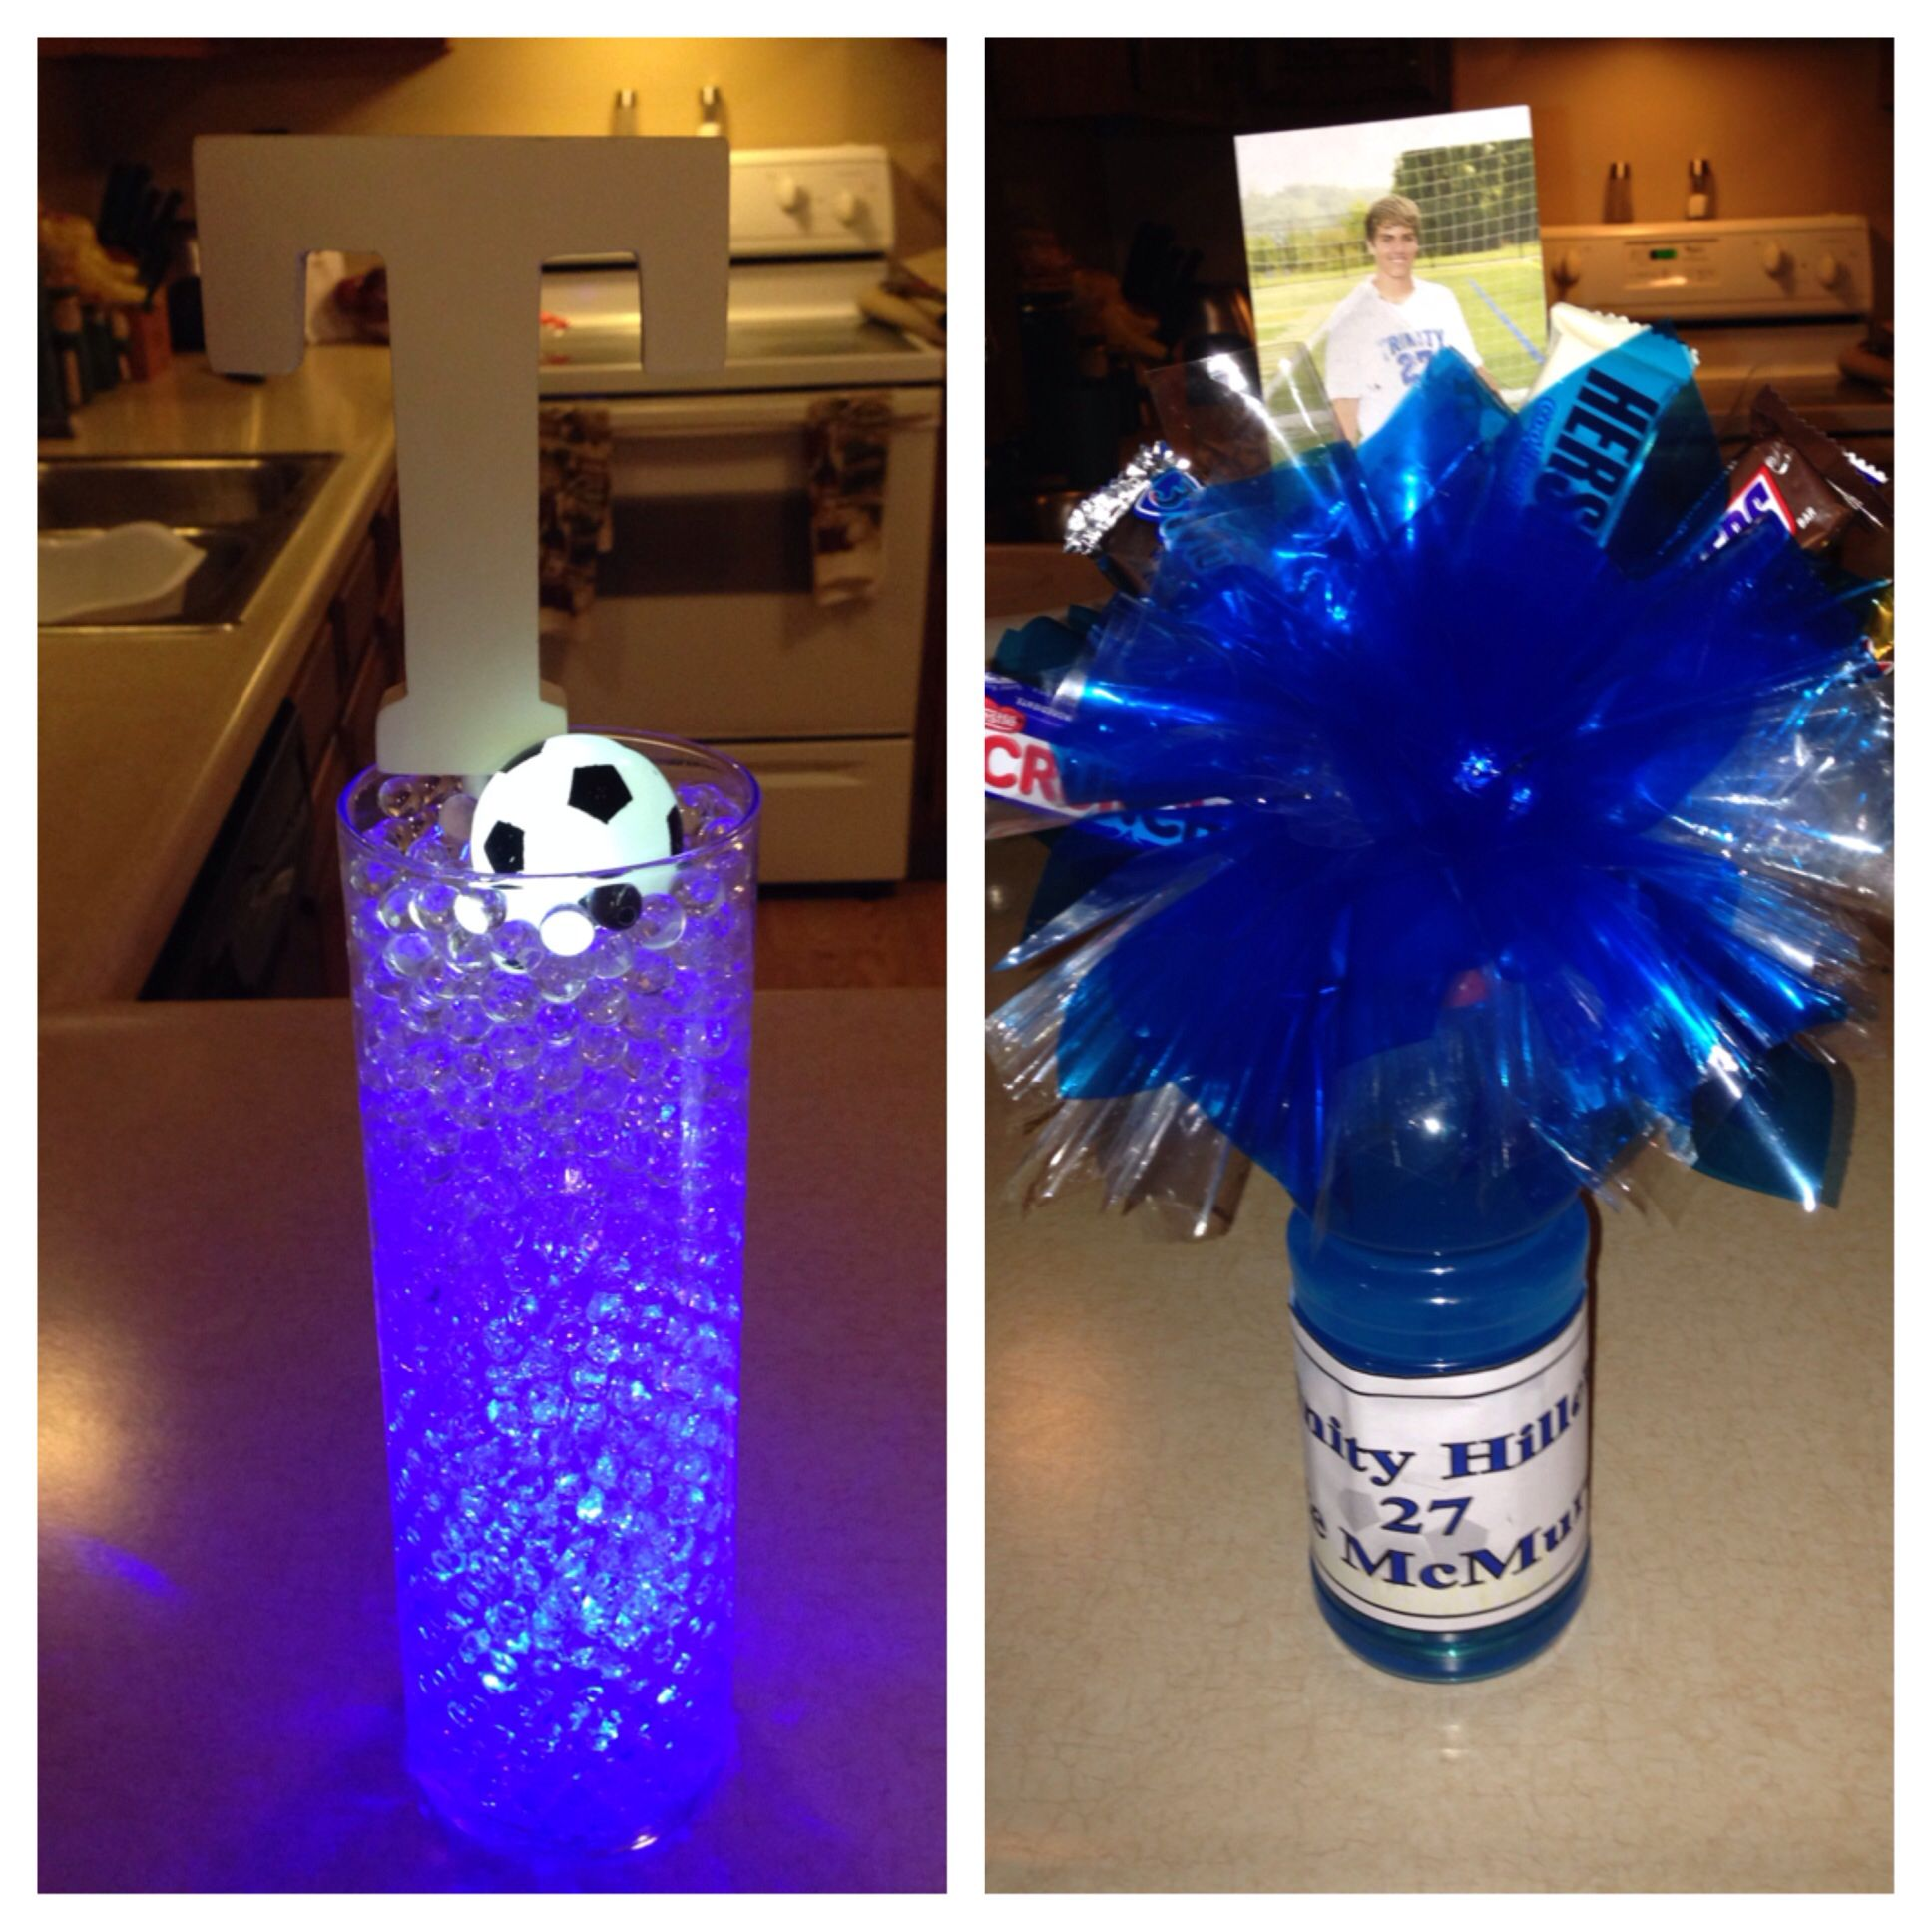 Soccer Banquet Centerpieces I Made